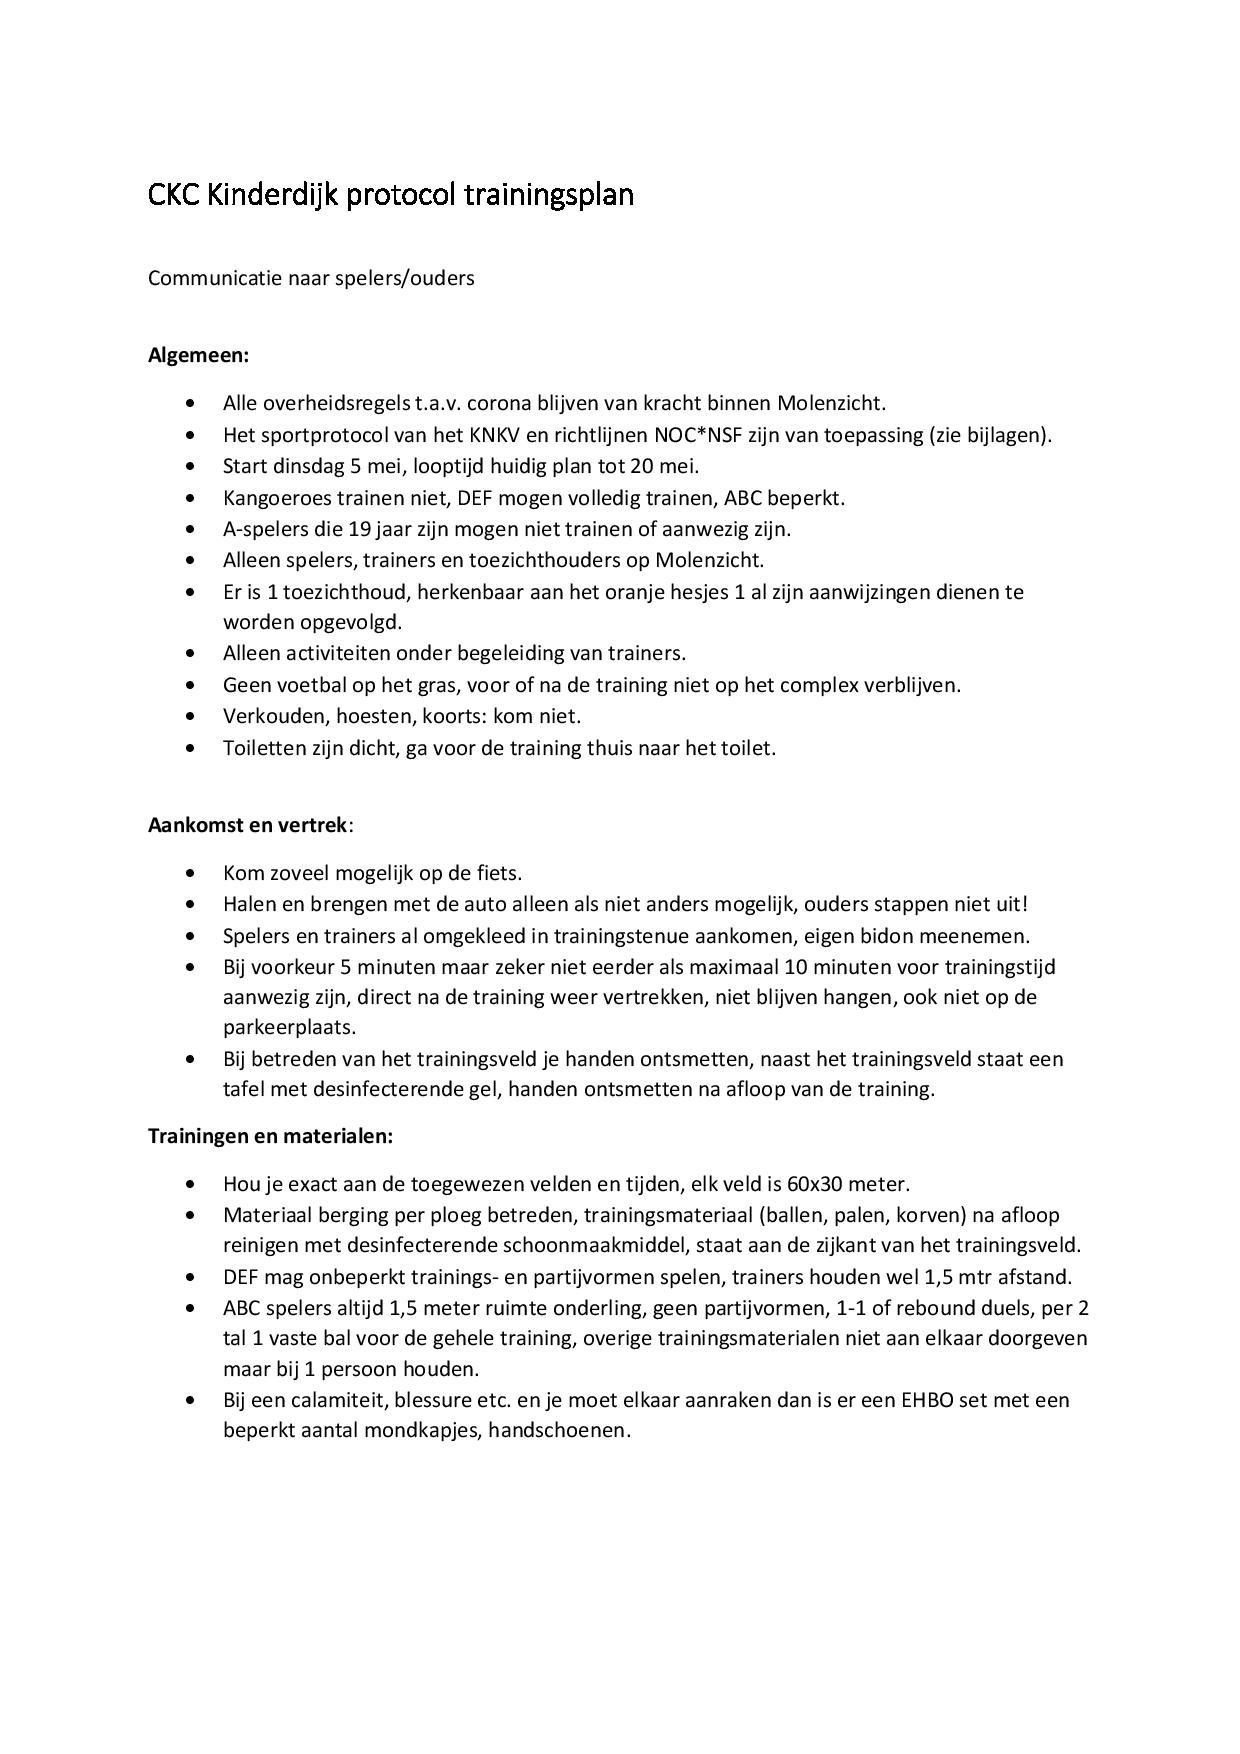 CKC Kinderdijk protocol trainingsplan